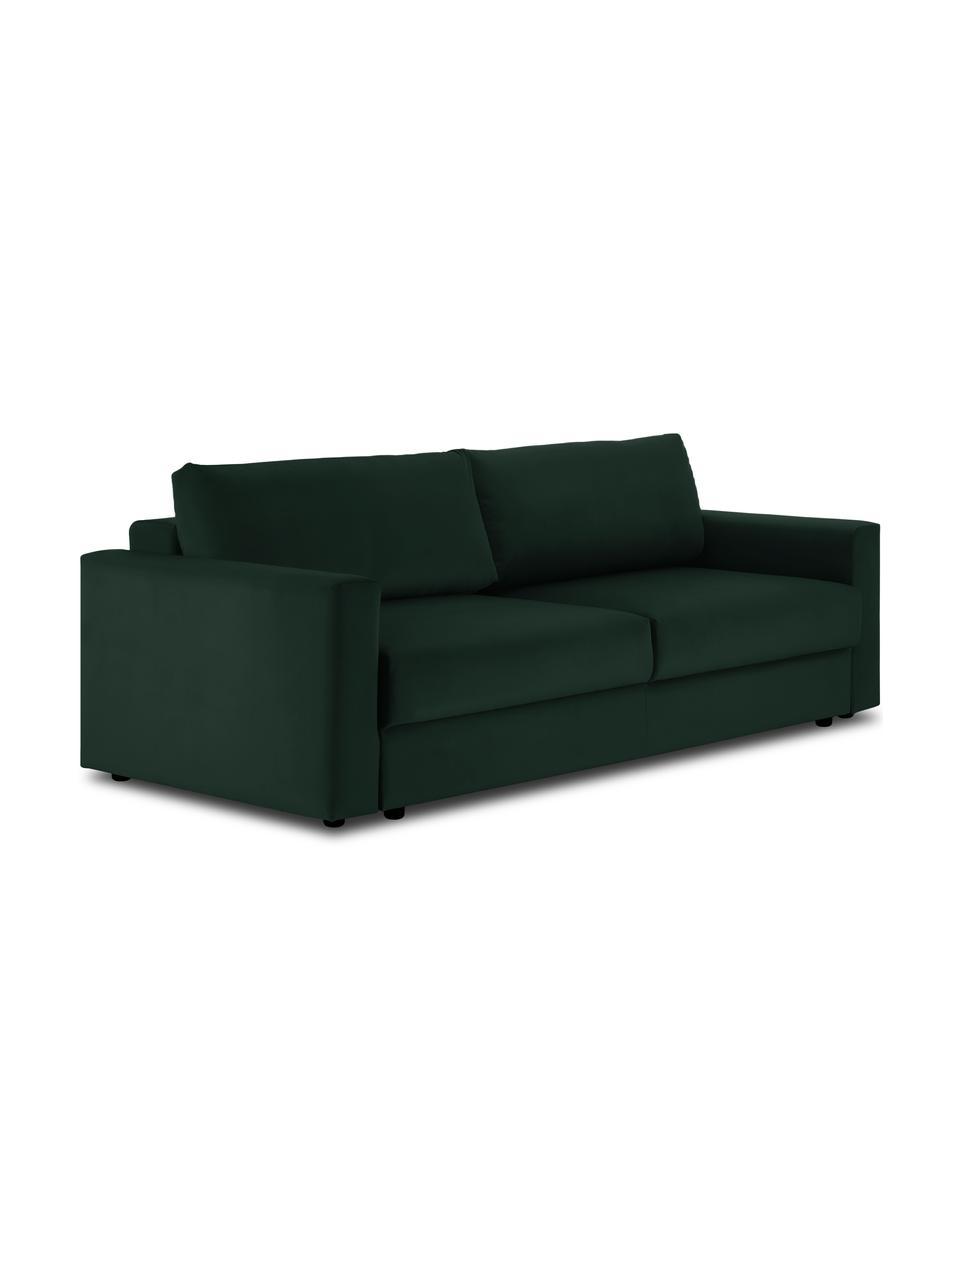 Canapé convertible en velours Tasha, Velours vert